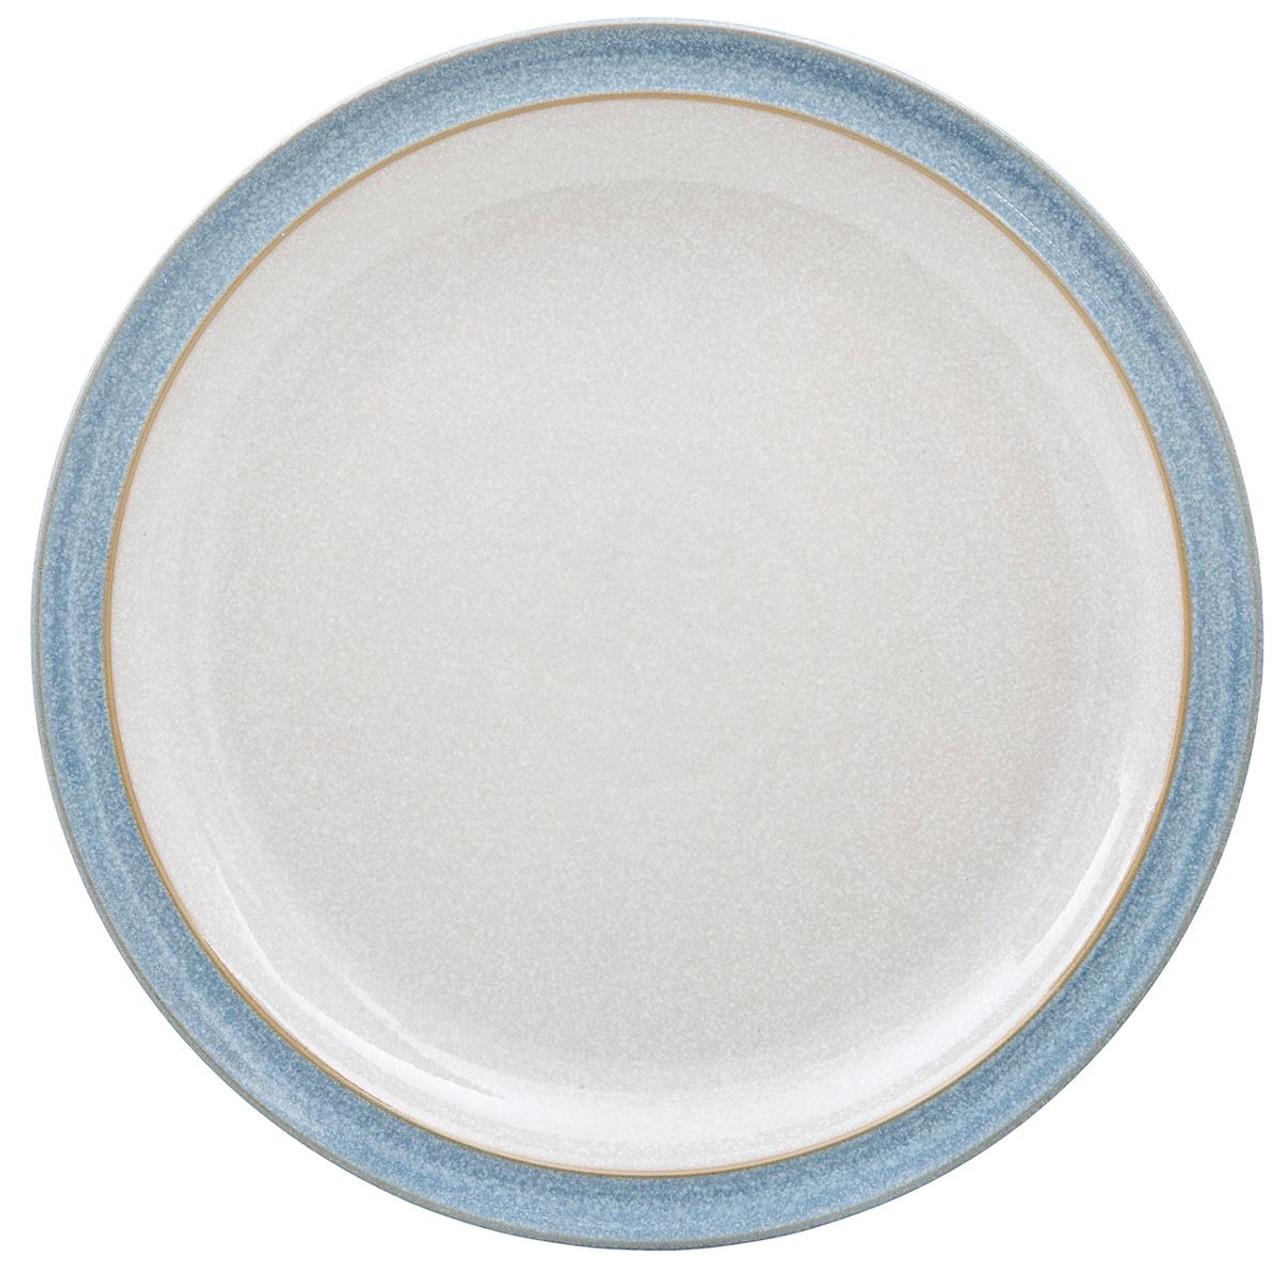 Denby Elements Light Blue Dinner Plate